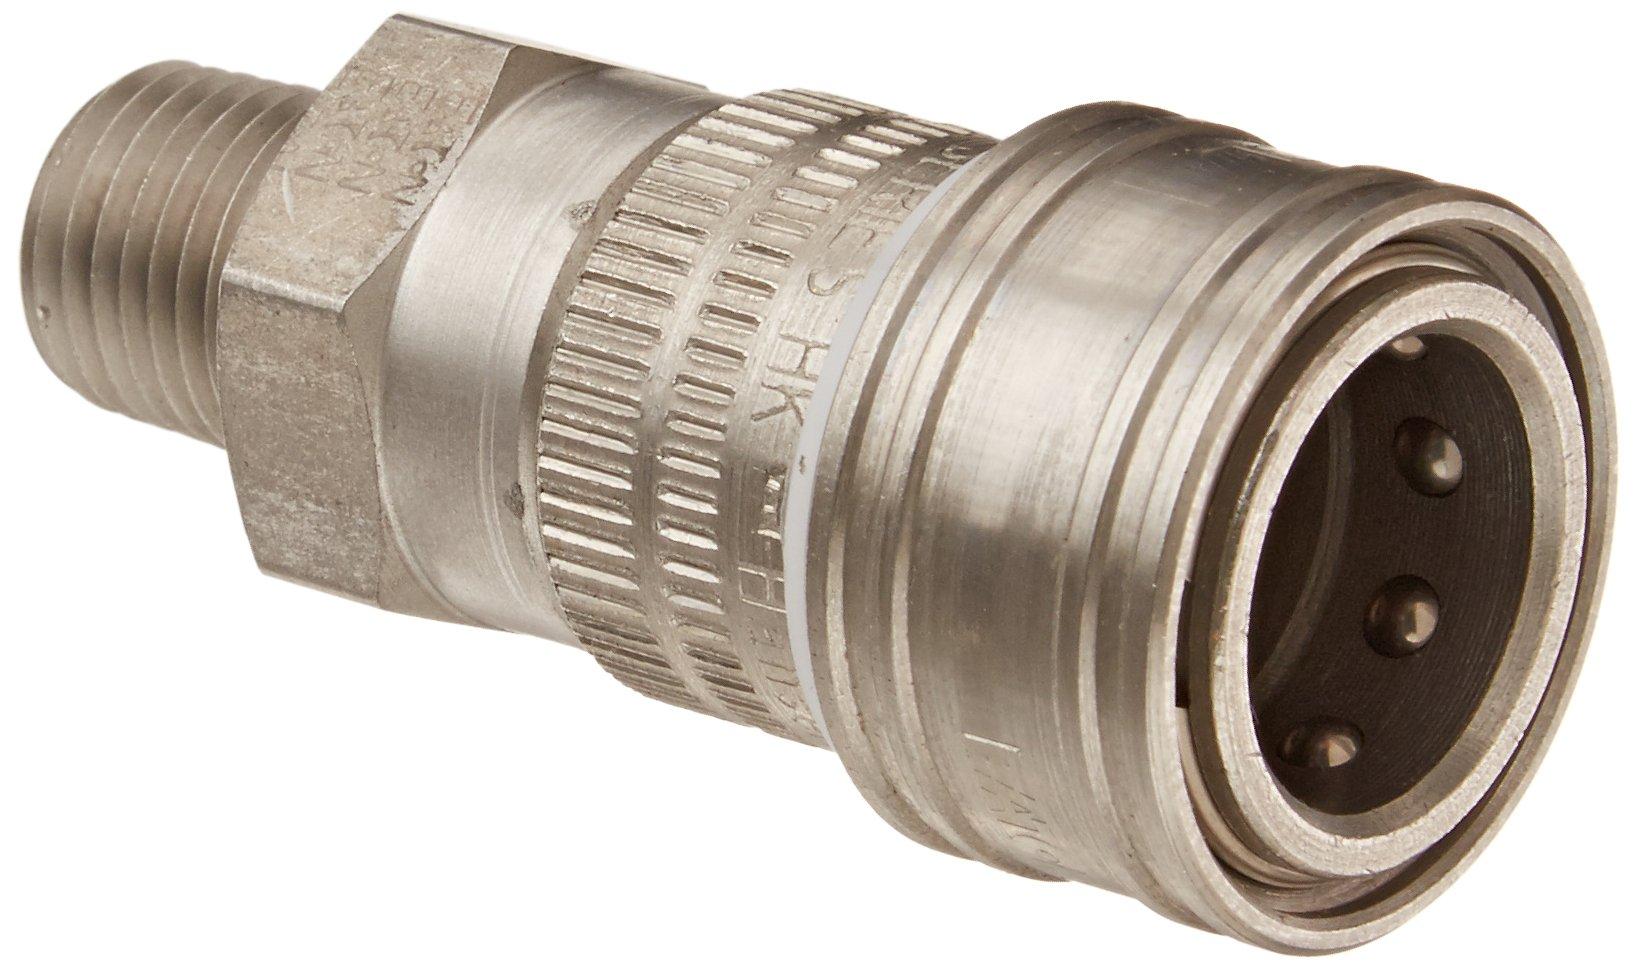 Eaton Hansen 2HIG15 Stainless Steel Ball Lock Hydraulic Fitting, Socket, 1/4''-18 NPTF Male, 1/4'' Body